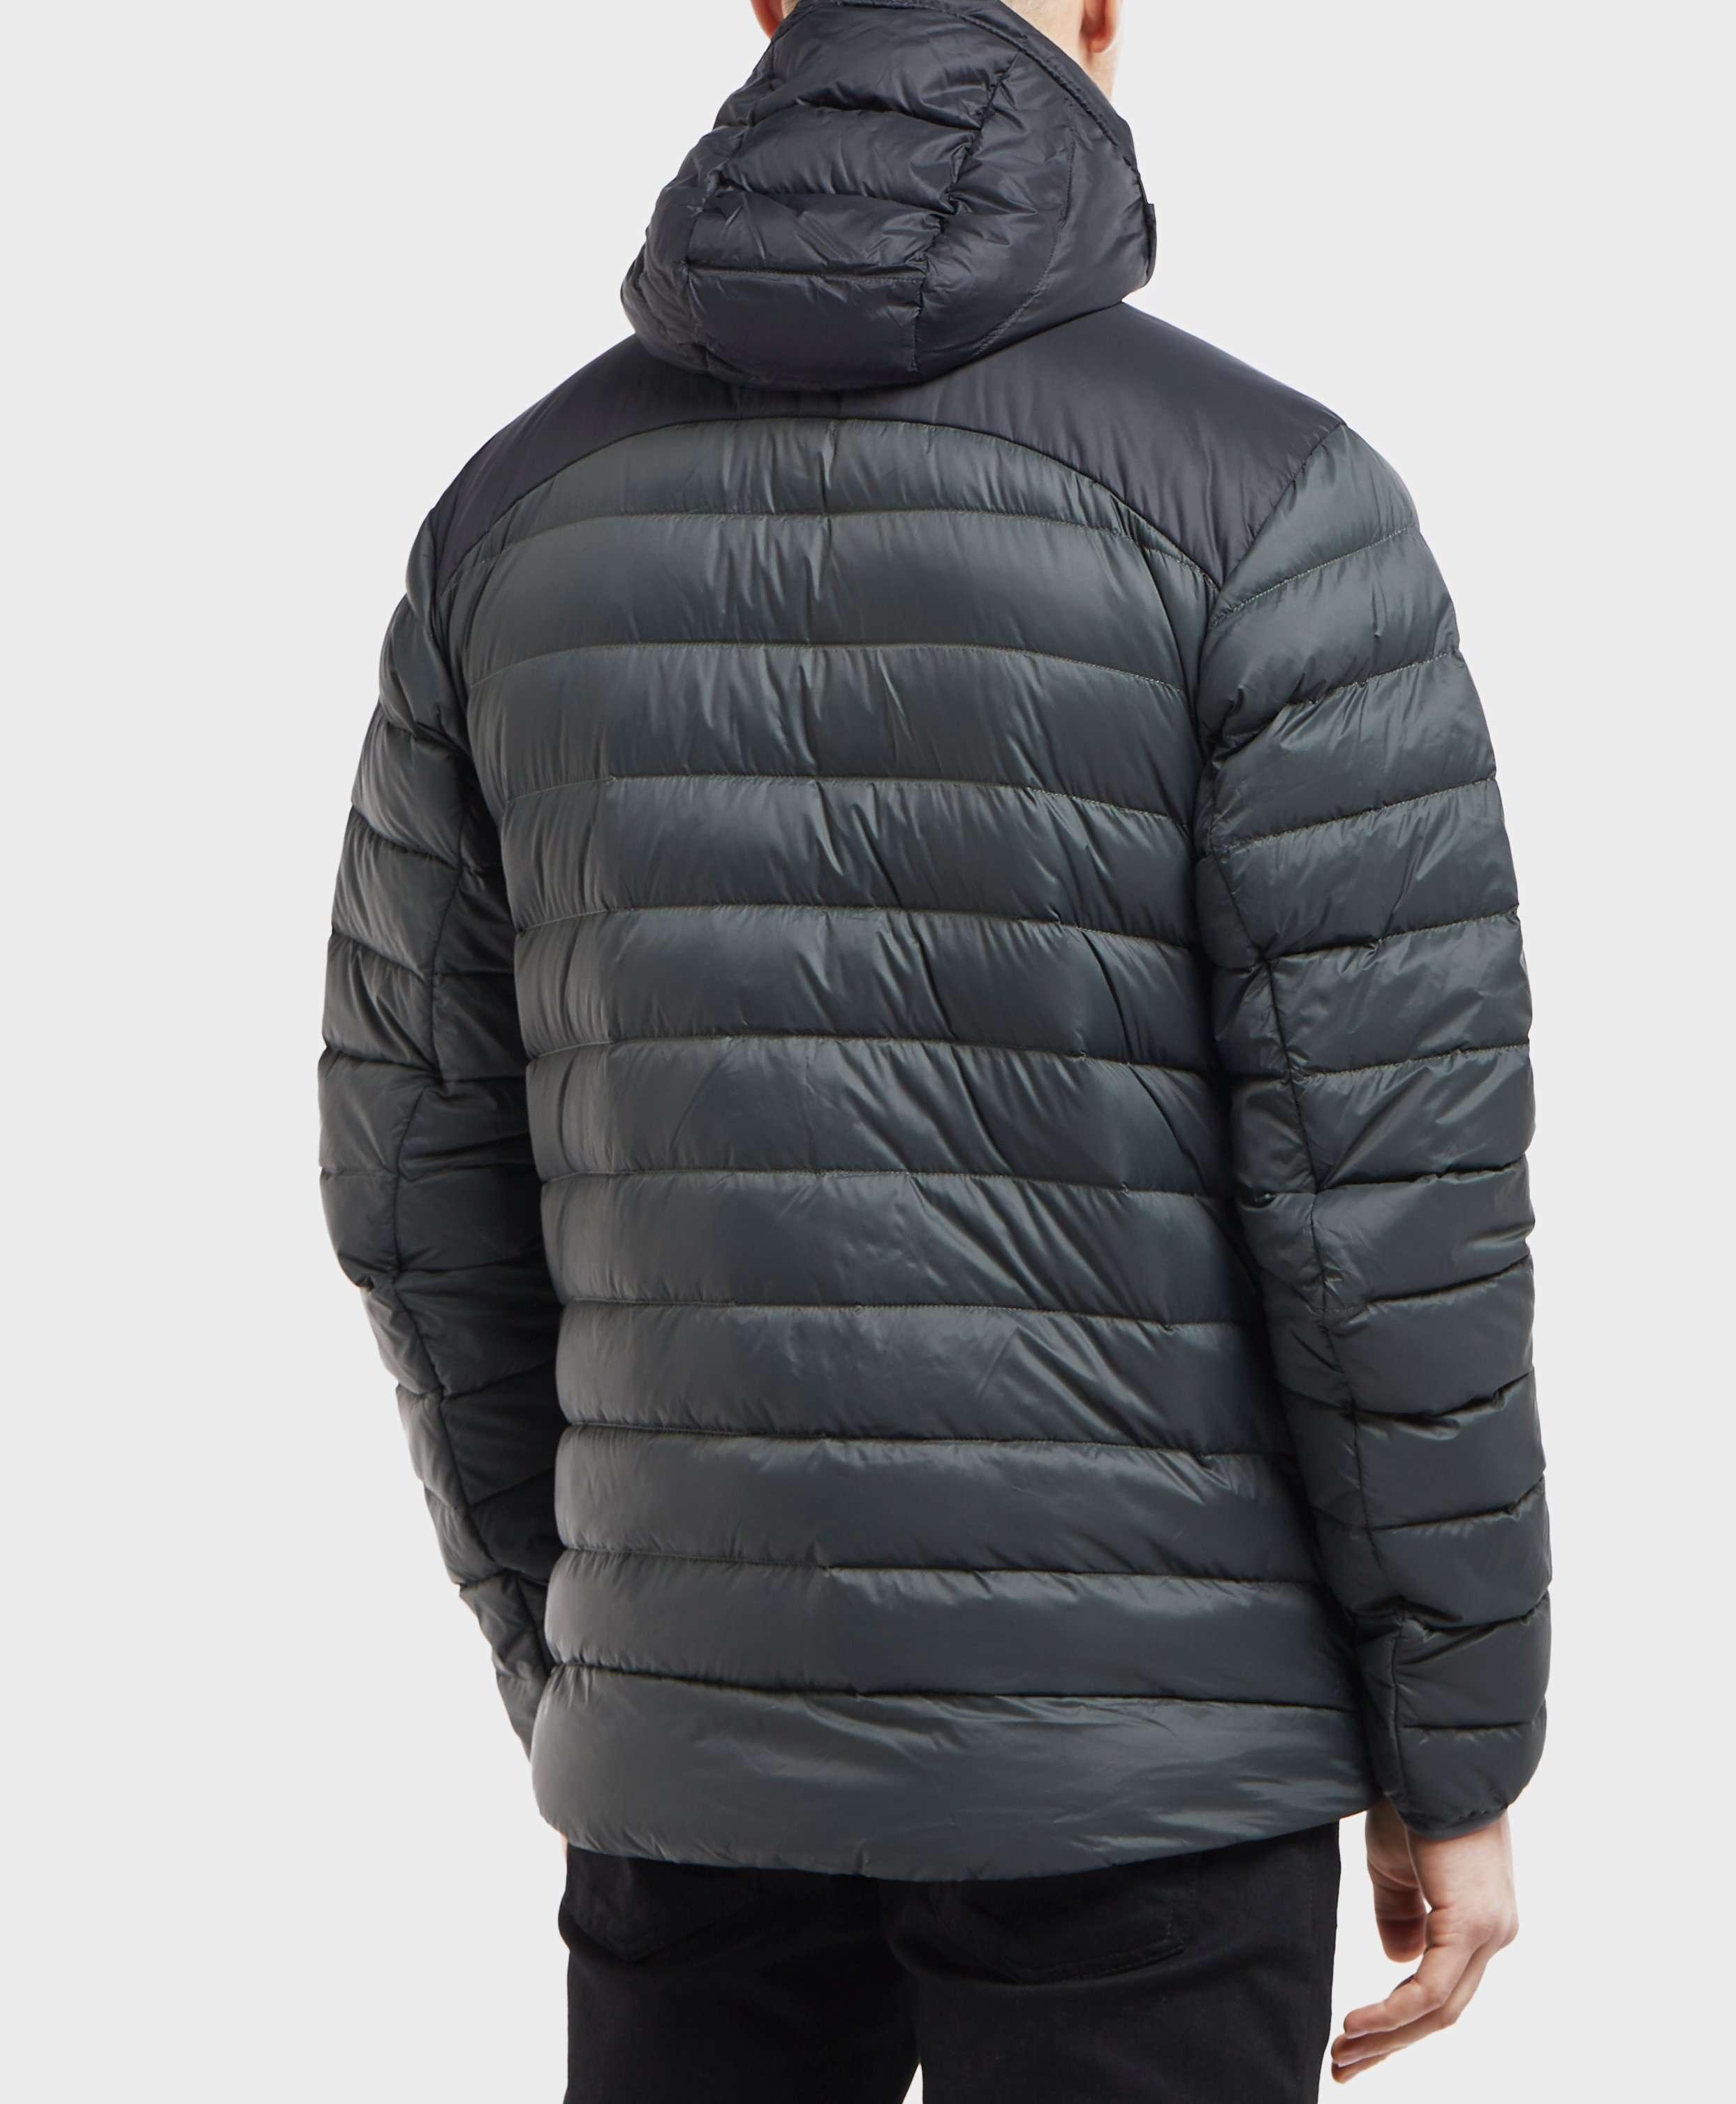 Fjallraven Keb Touring Padded Jacket